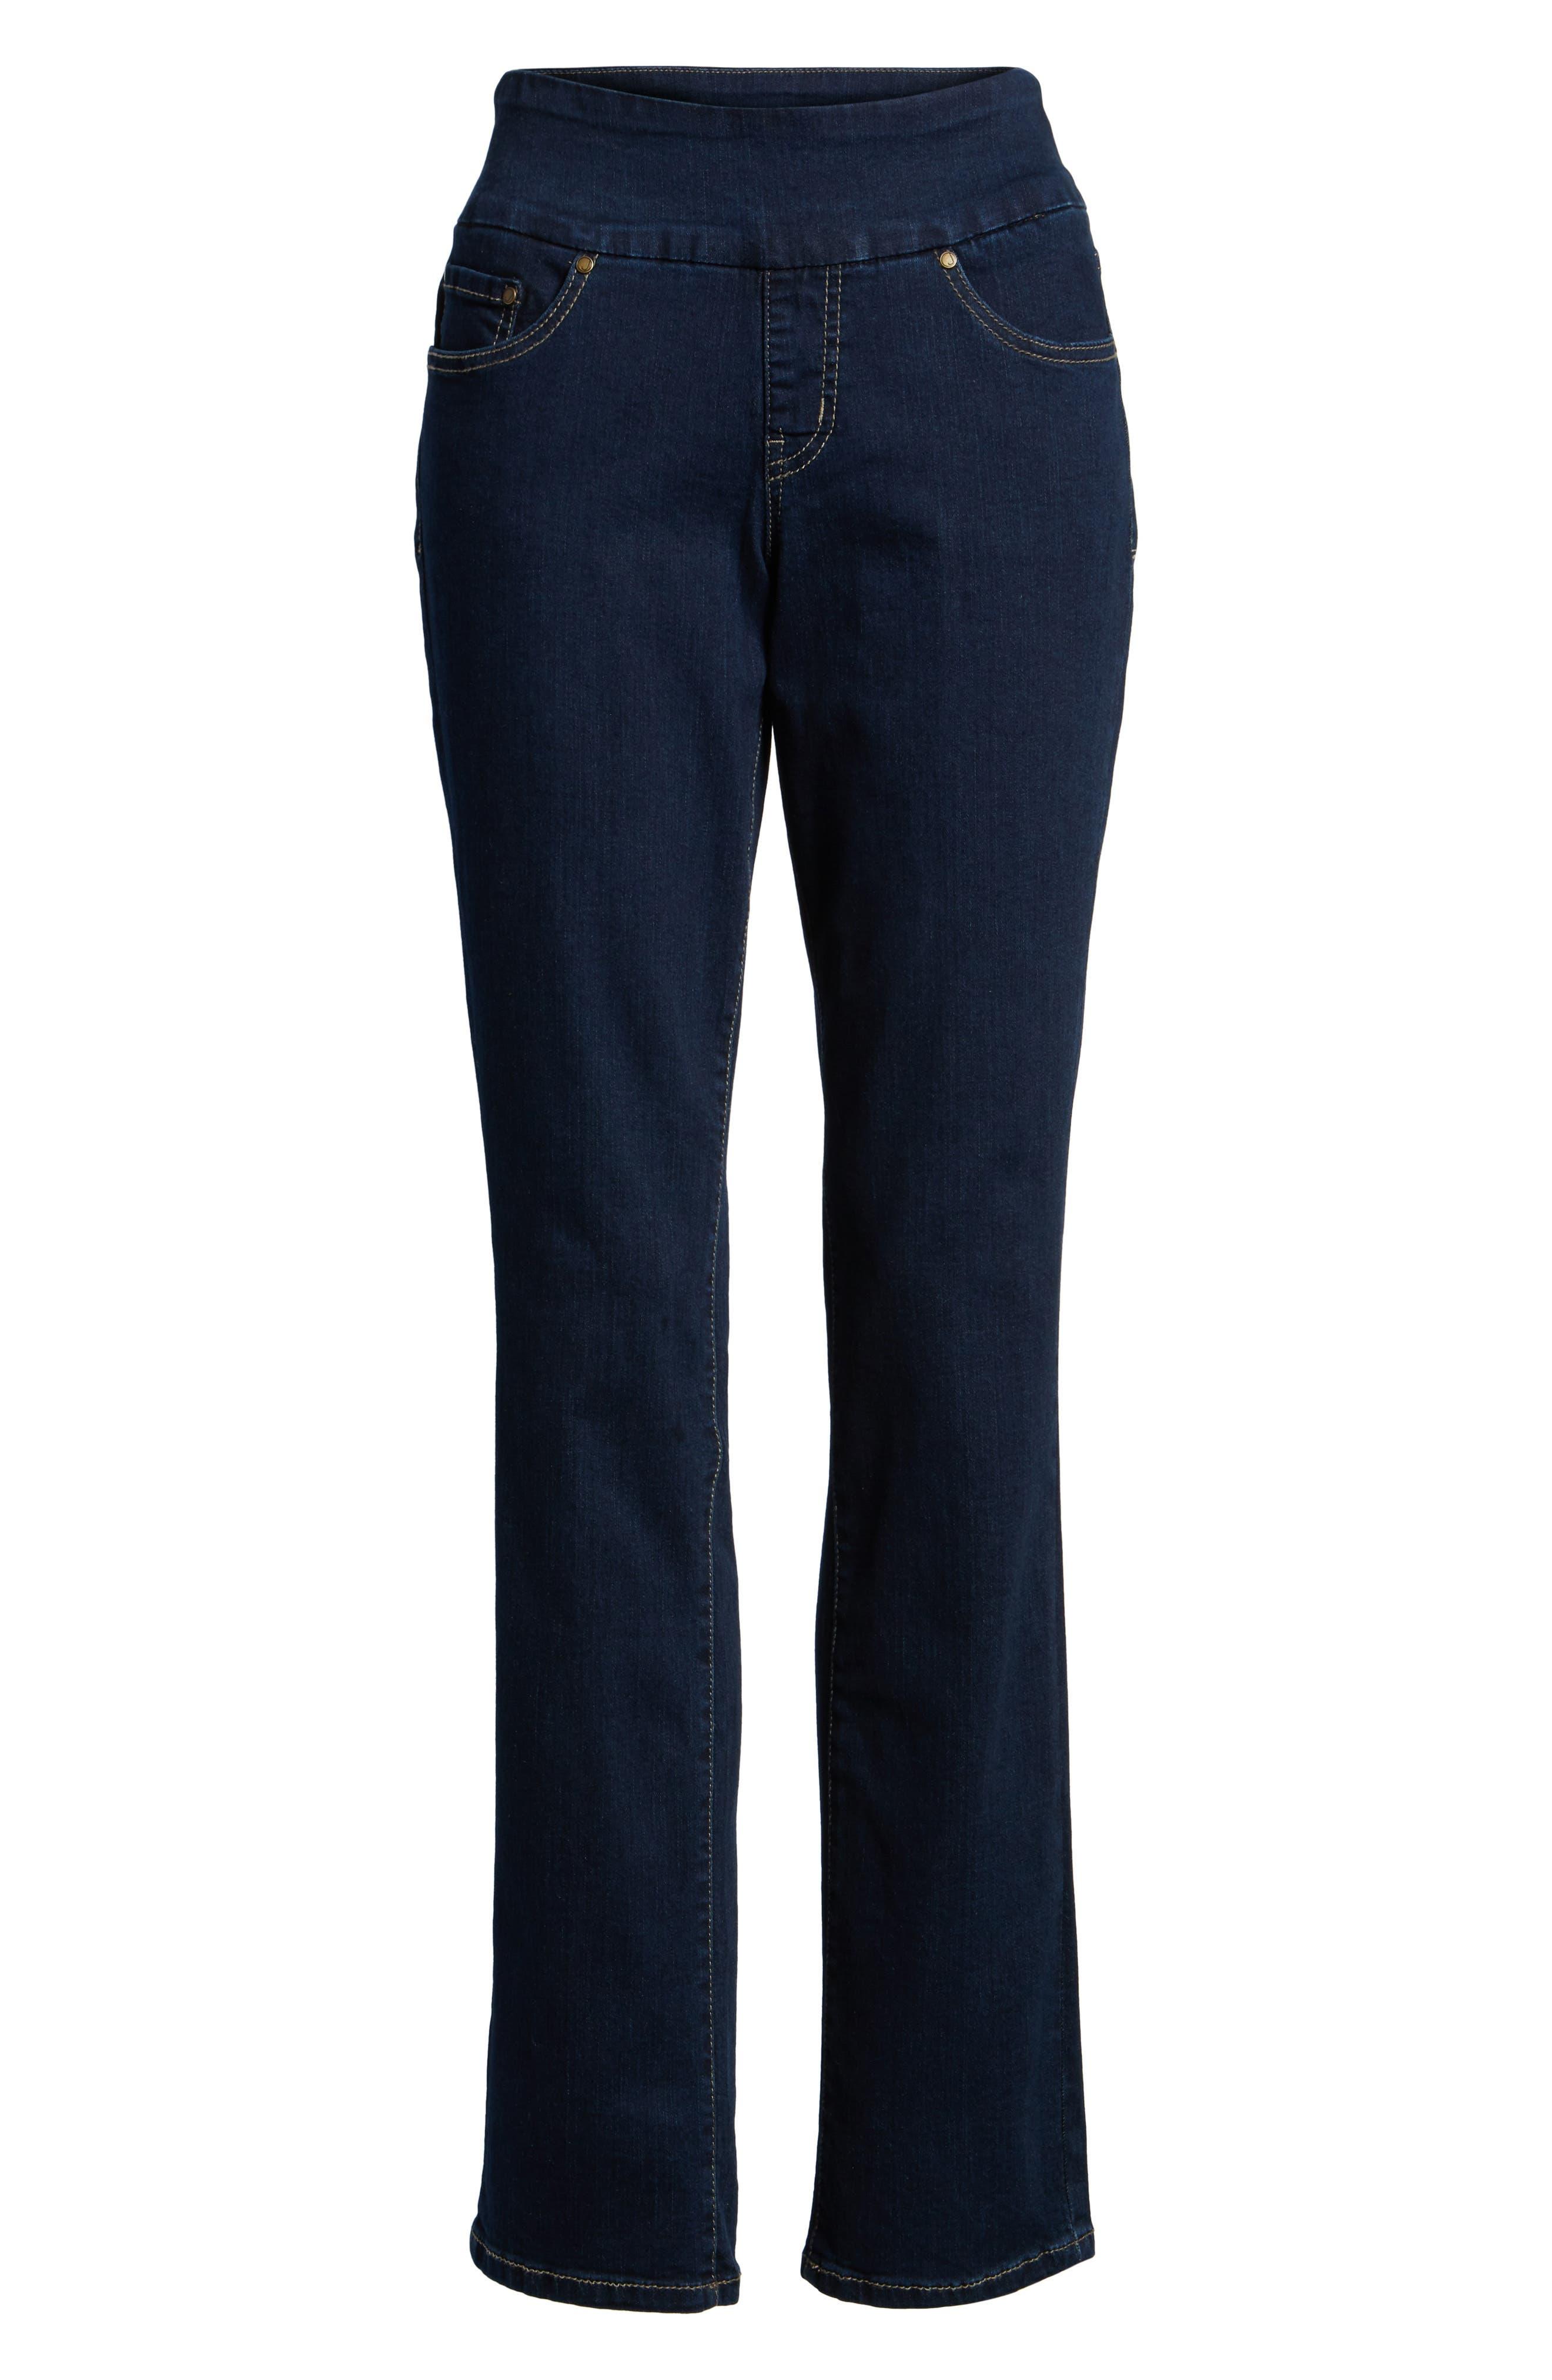 Peri Pull-On Straight Leg Jeans,                             Alternate thumbnail 6, color,                             DARK INDIGO